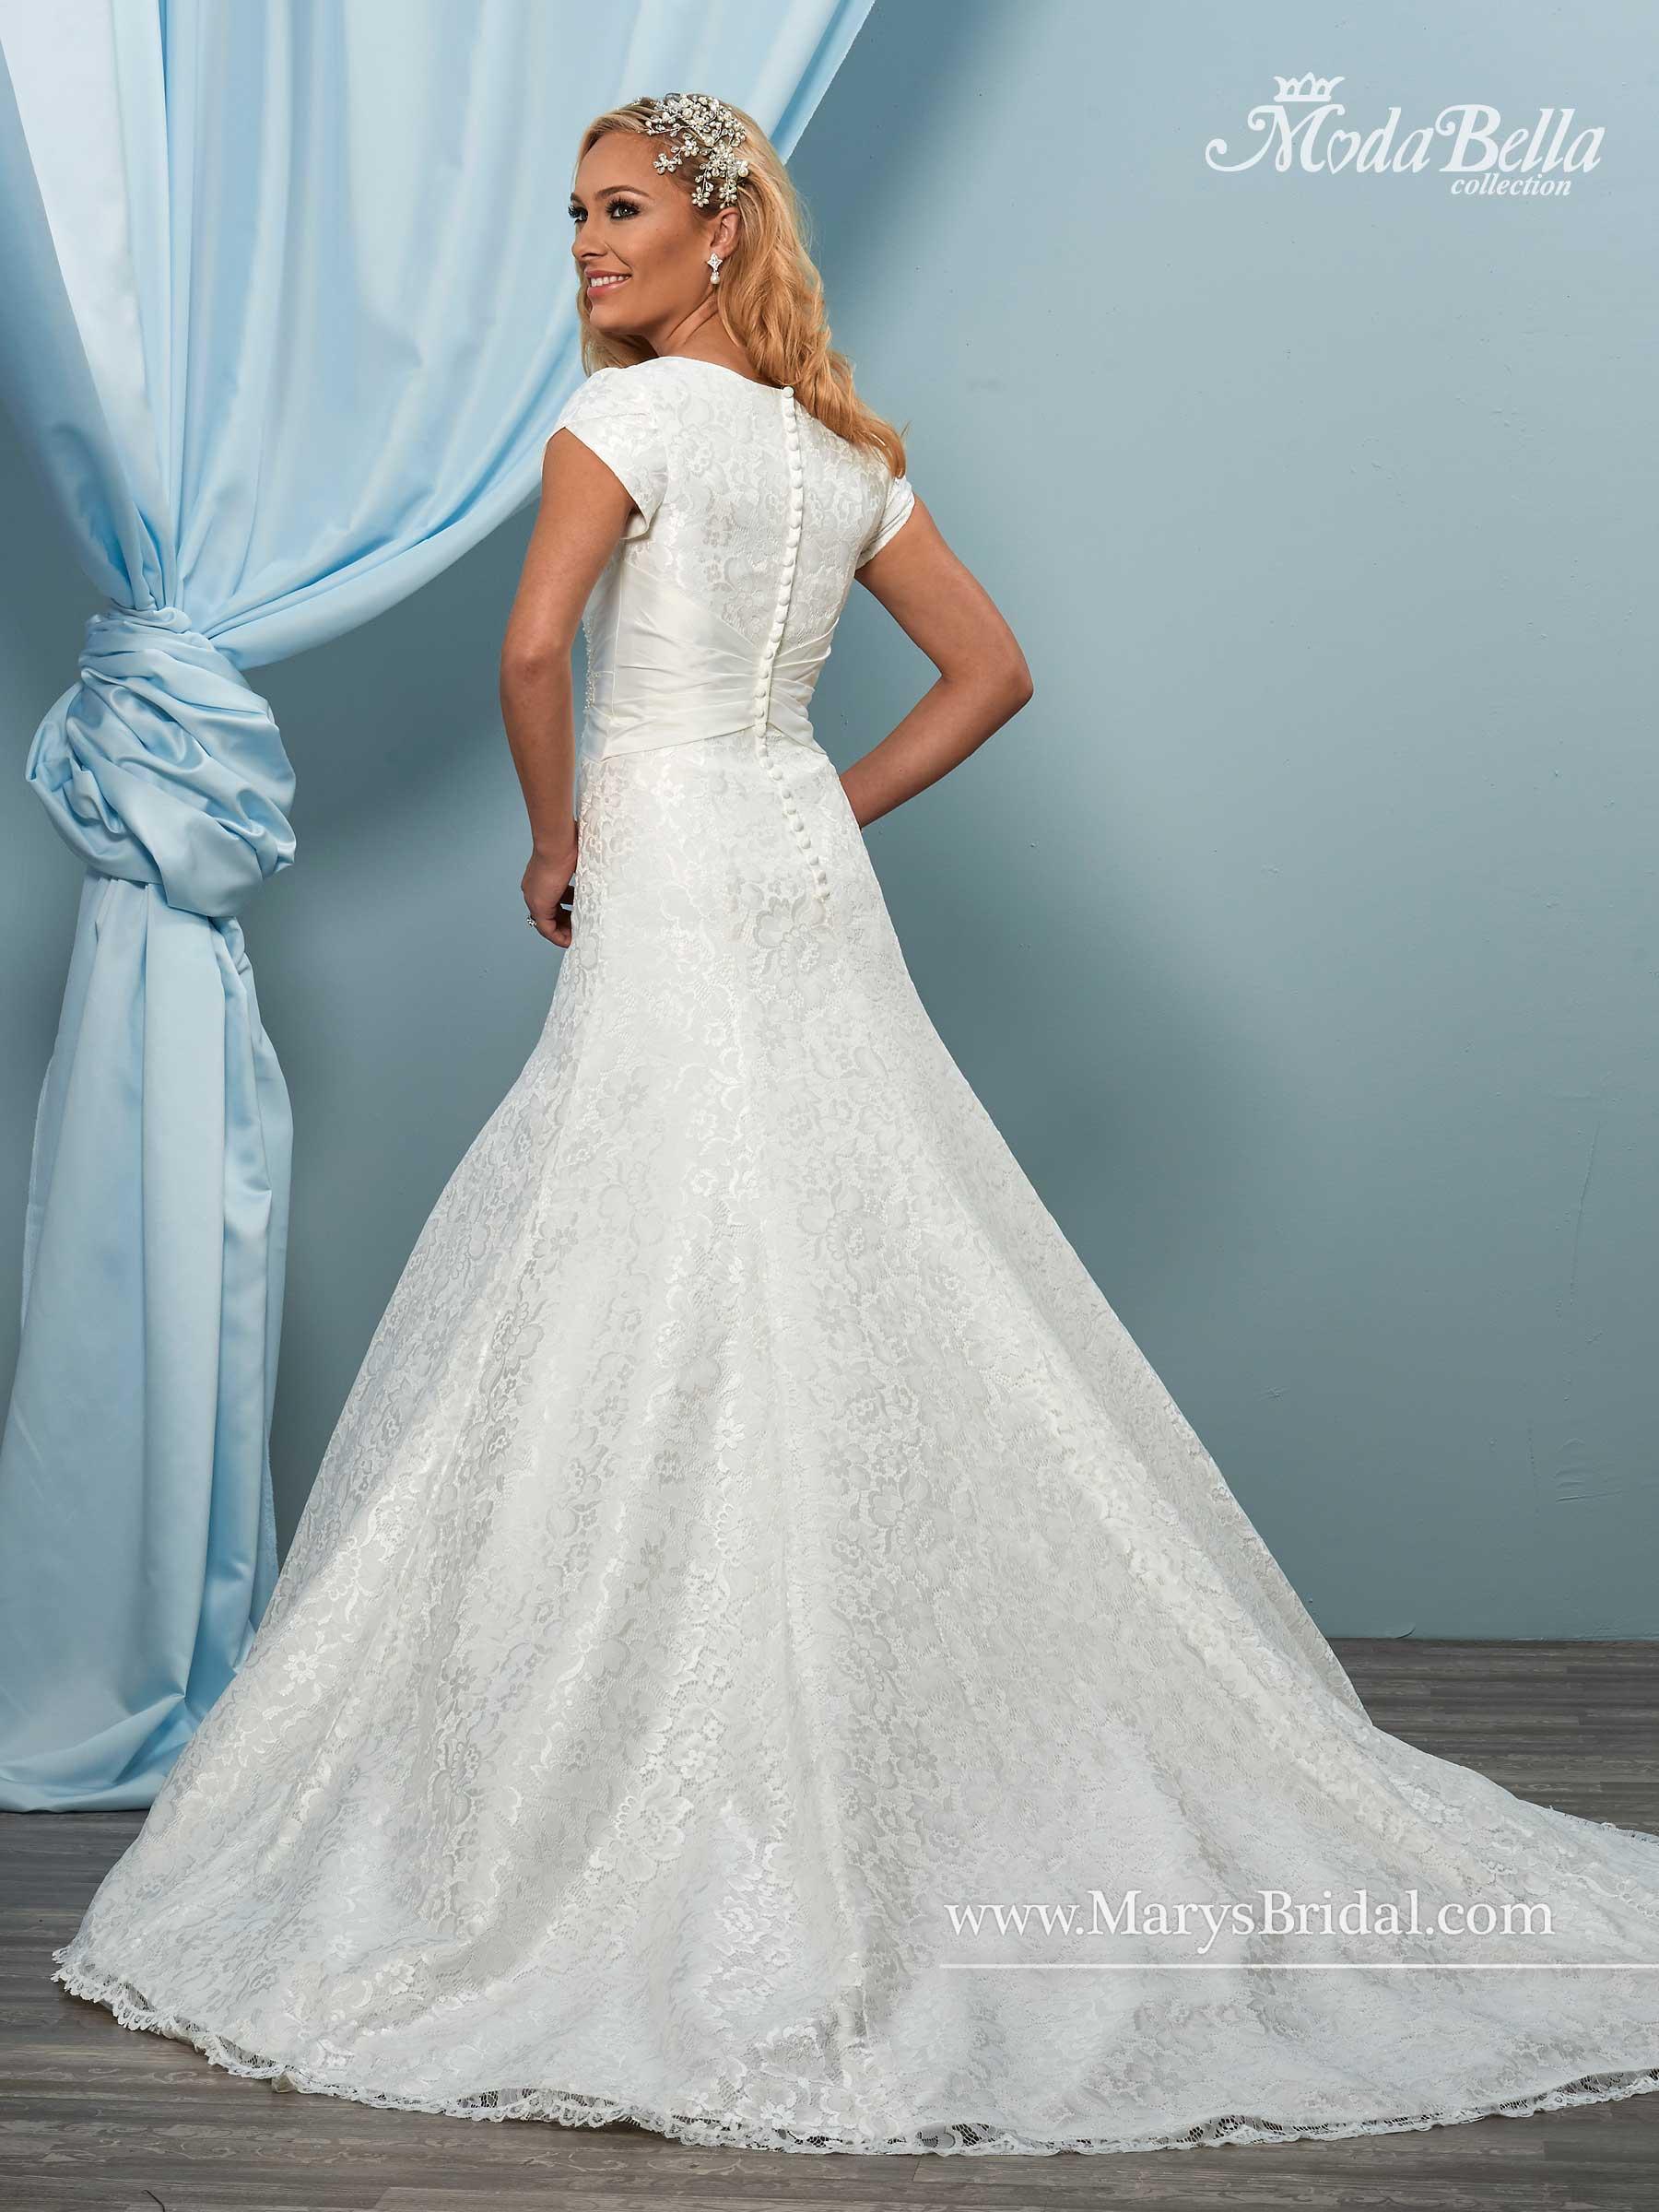 Bridal Dresses | Moda Bella | Style - 3Y622